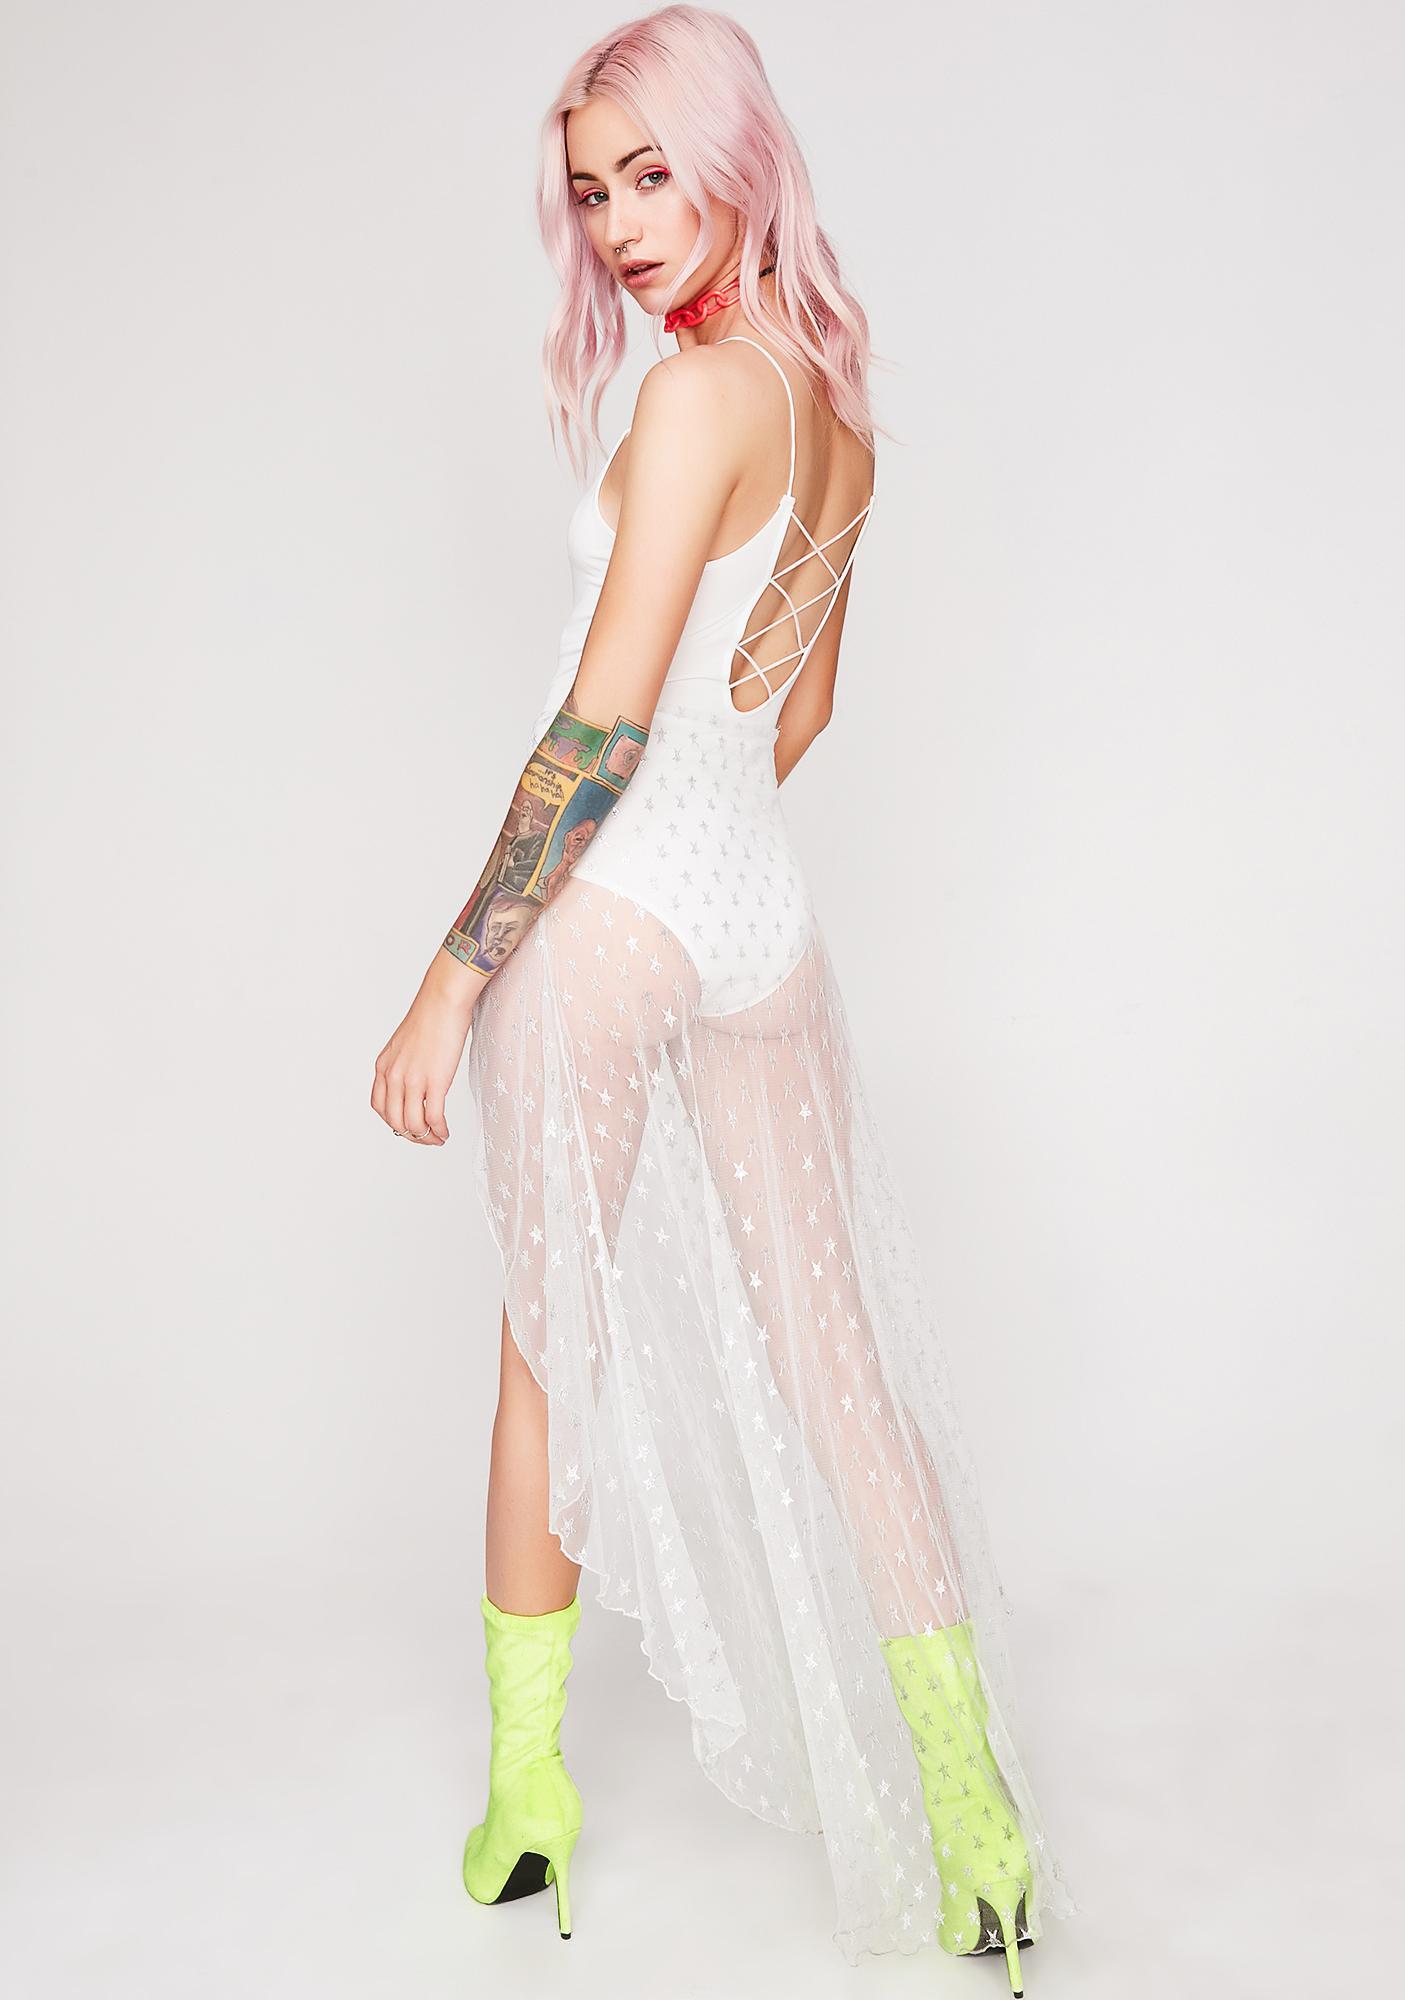 Icy Gypsy Rebel Sheer Dress